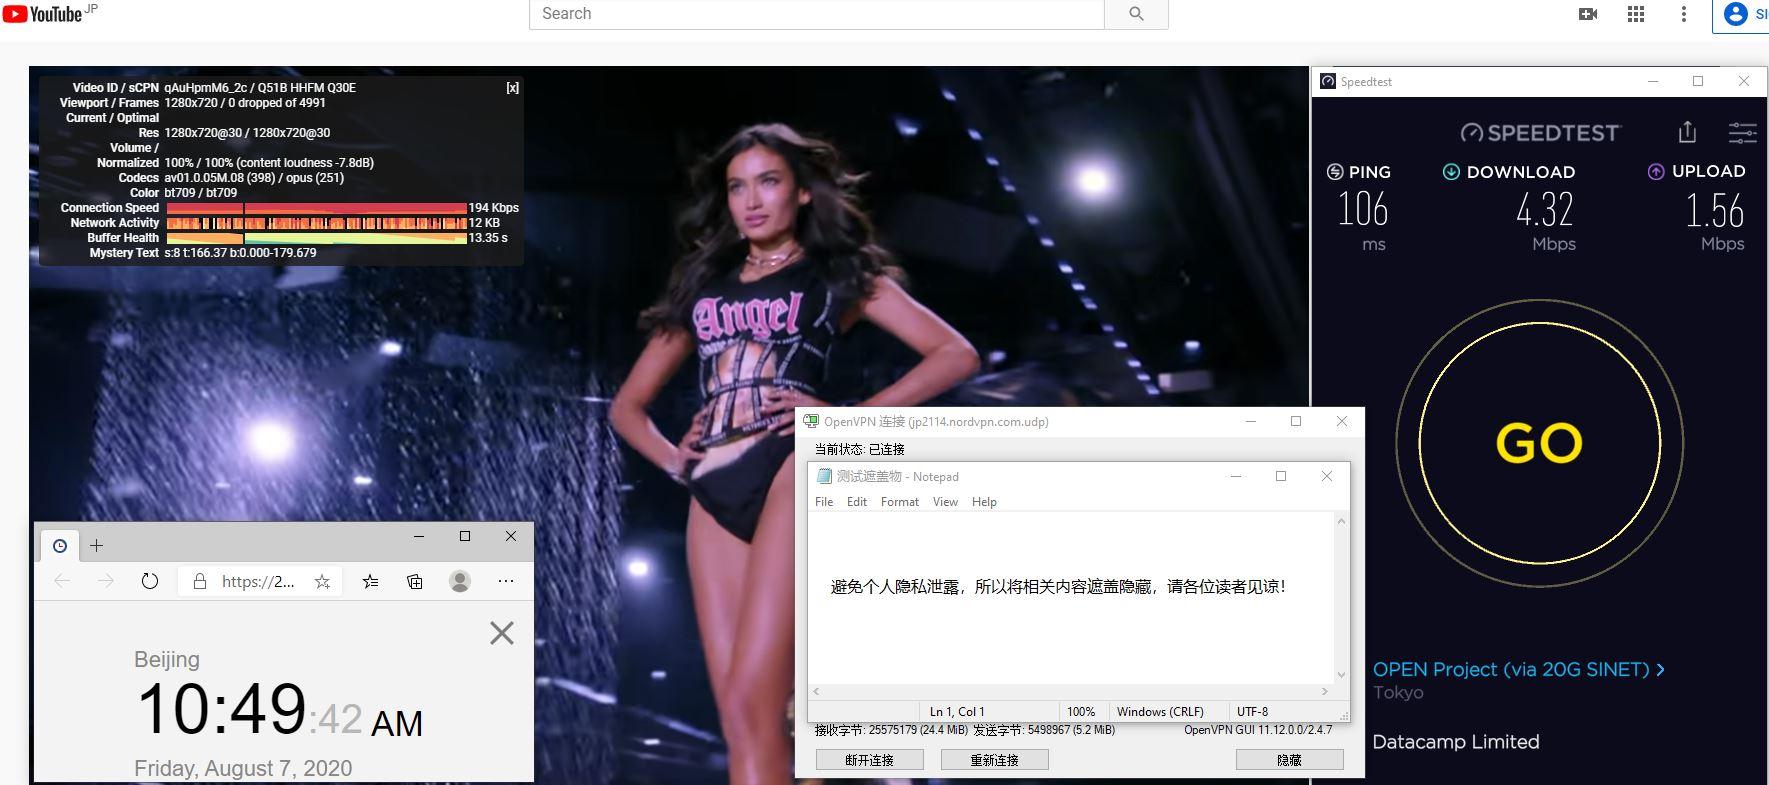 Windows10 NordVPN Open VPN GUI jp2114 中国VPN 翻墙 科学上网 翻墙速度测试 - 20200807